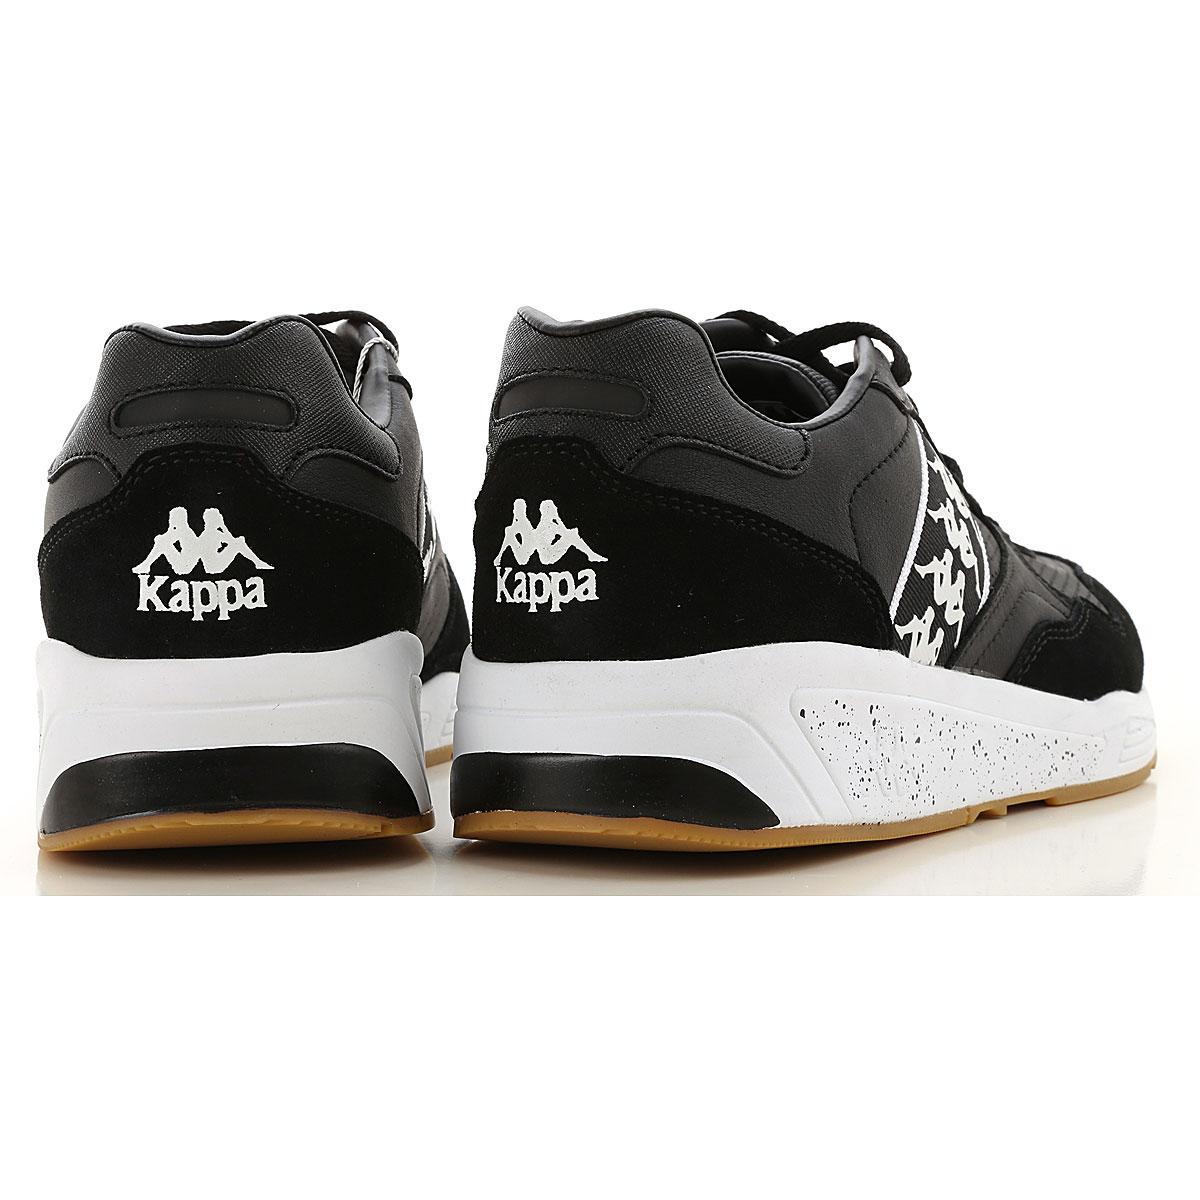 Kappa Lace Sneakers For Men in Black